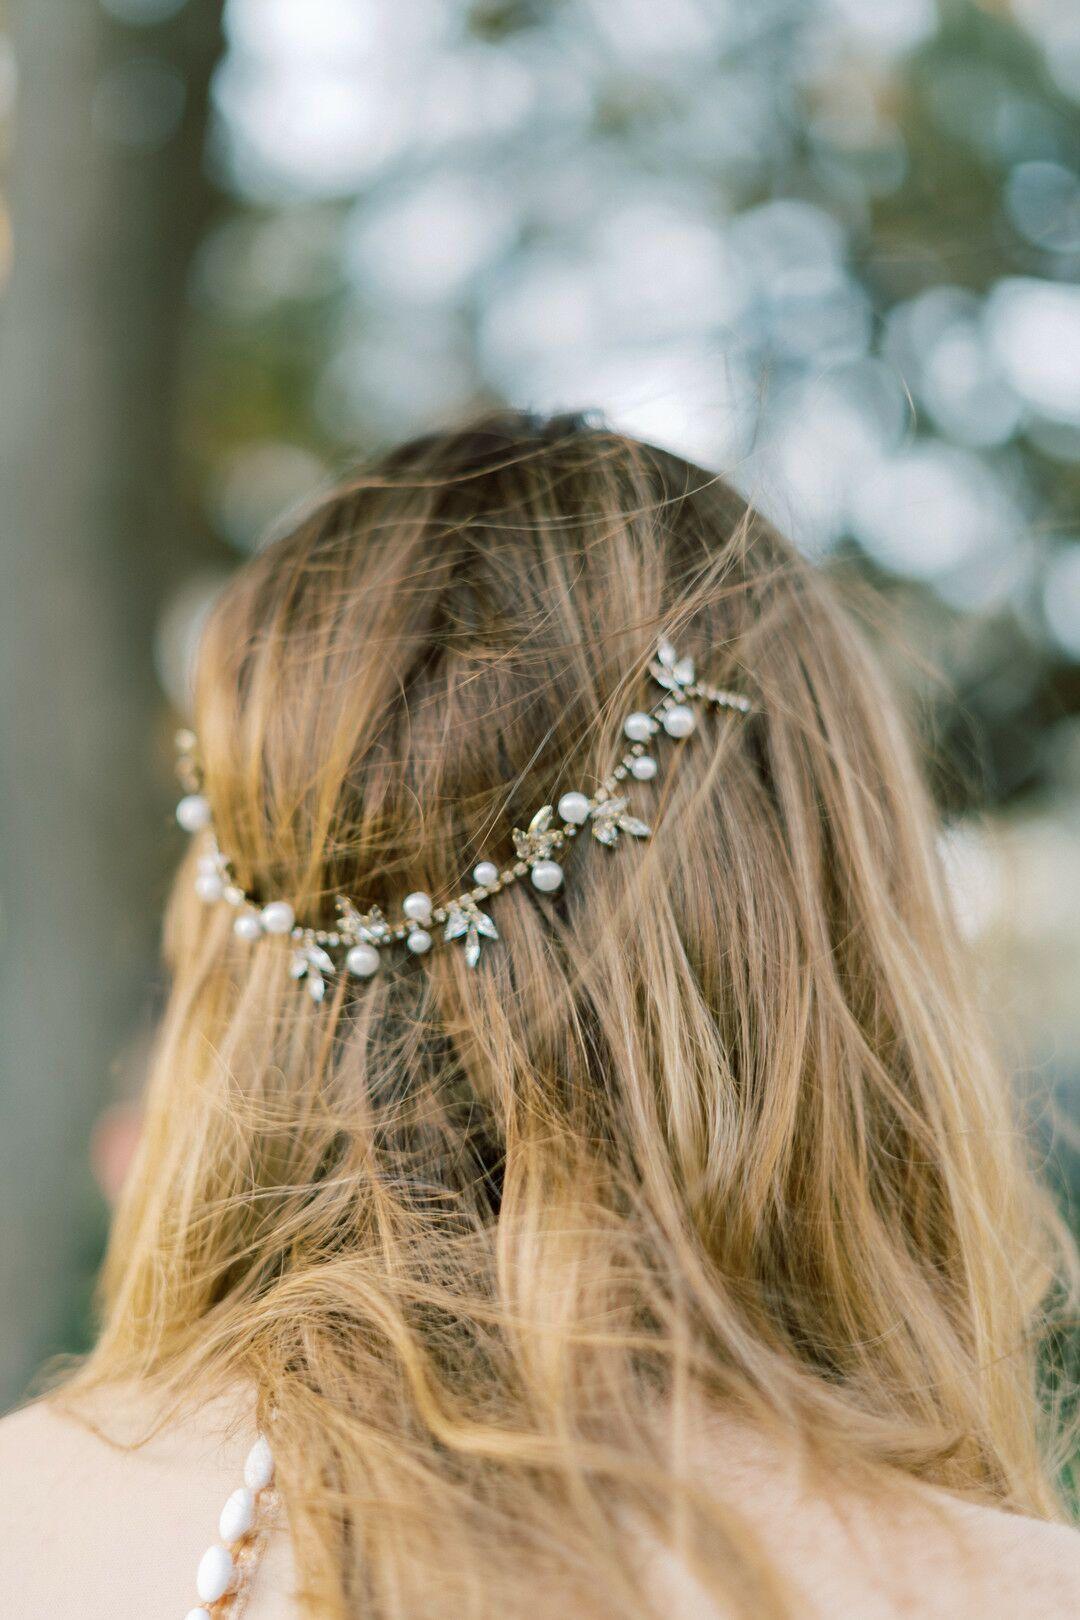 Braided Hairstyles Saleprice 15 In 2020 Hair Styles Long Hair Styles Medium Hair Styles